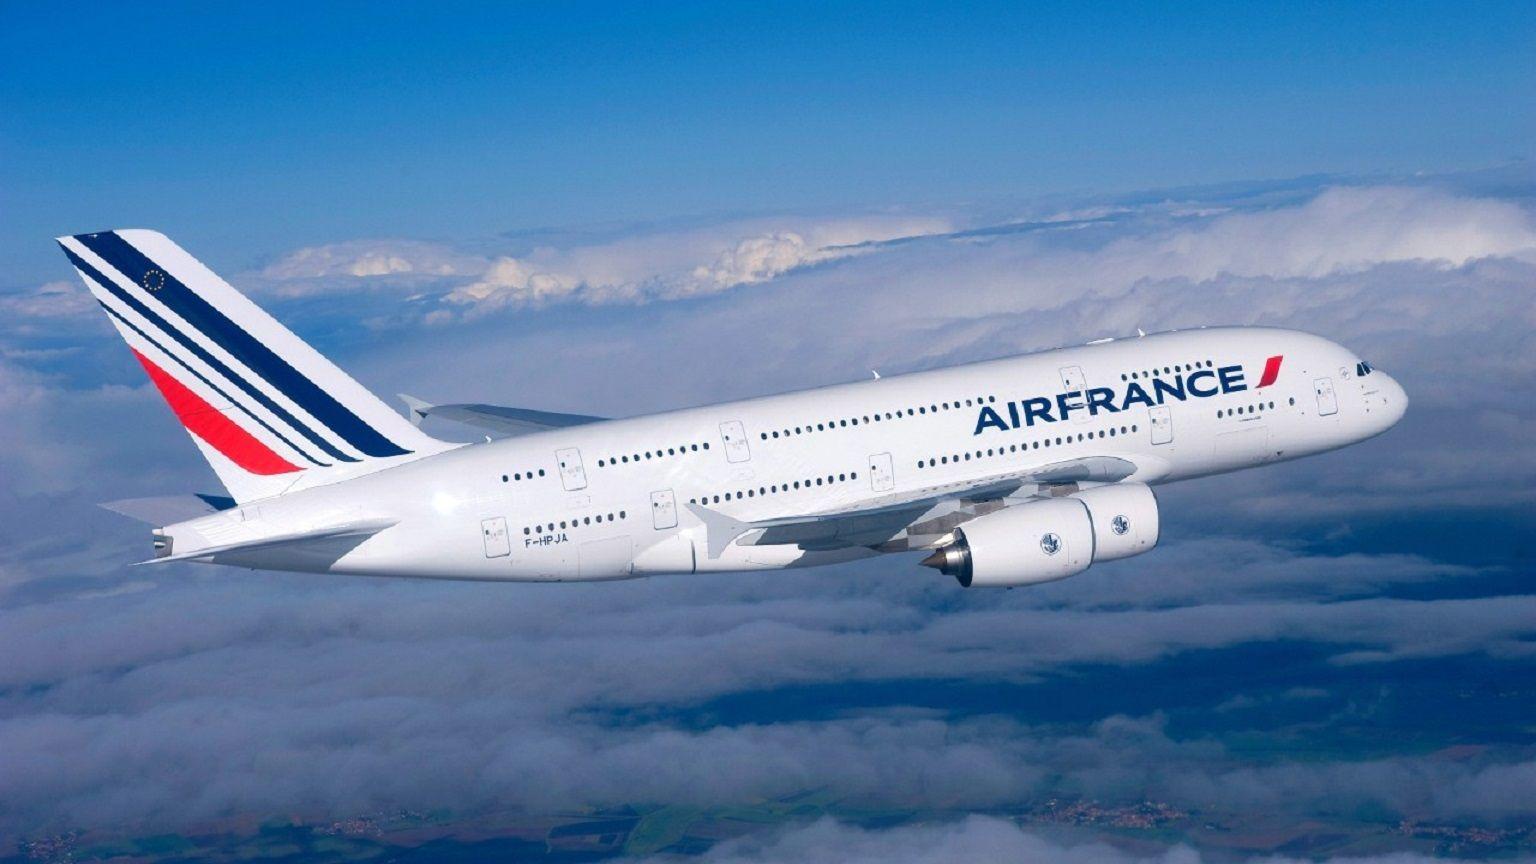 Air France denunció haber vivido un calvario en Argentina